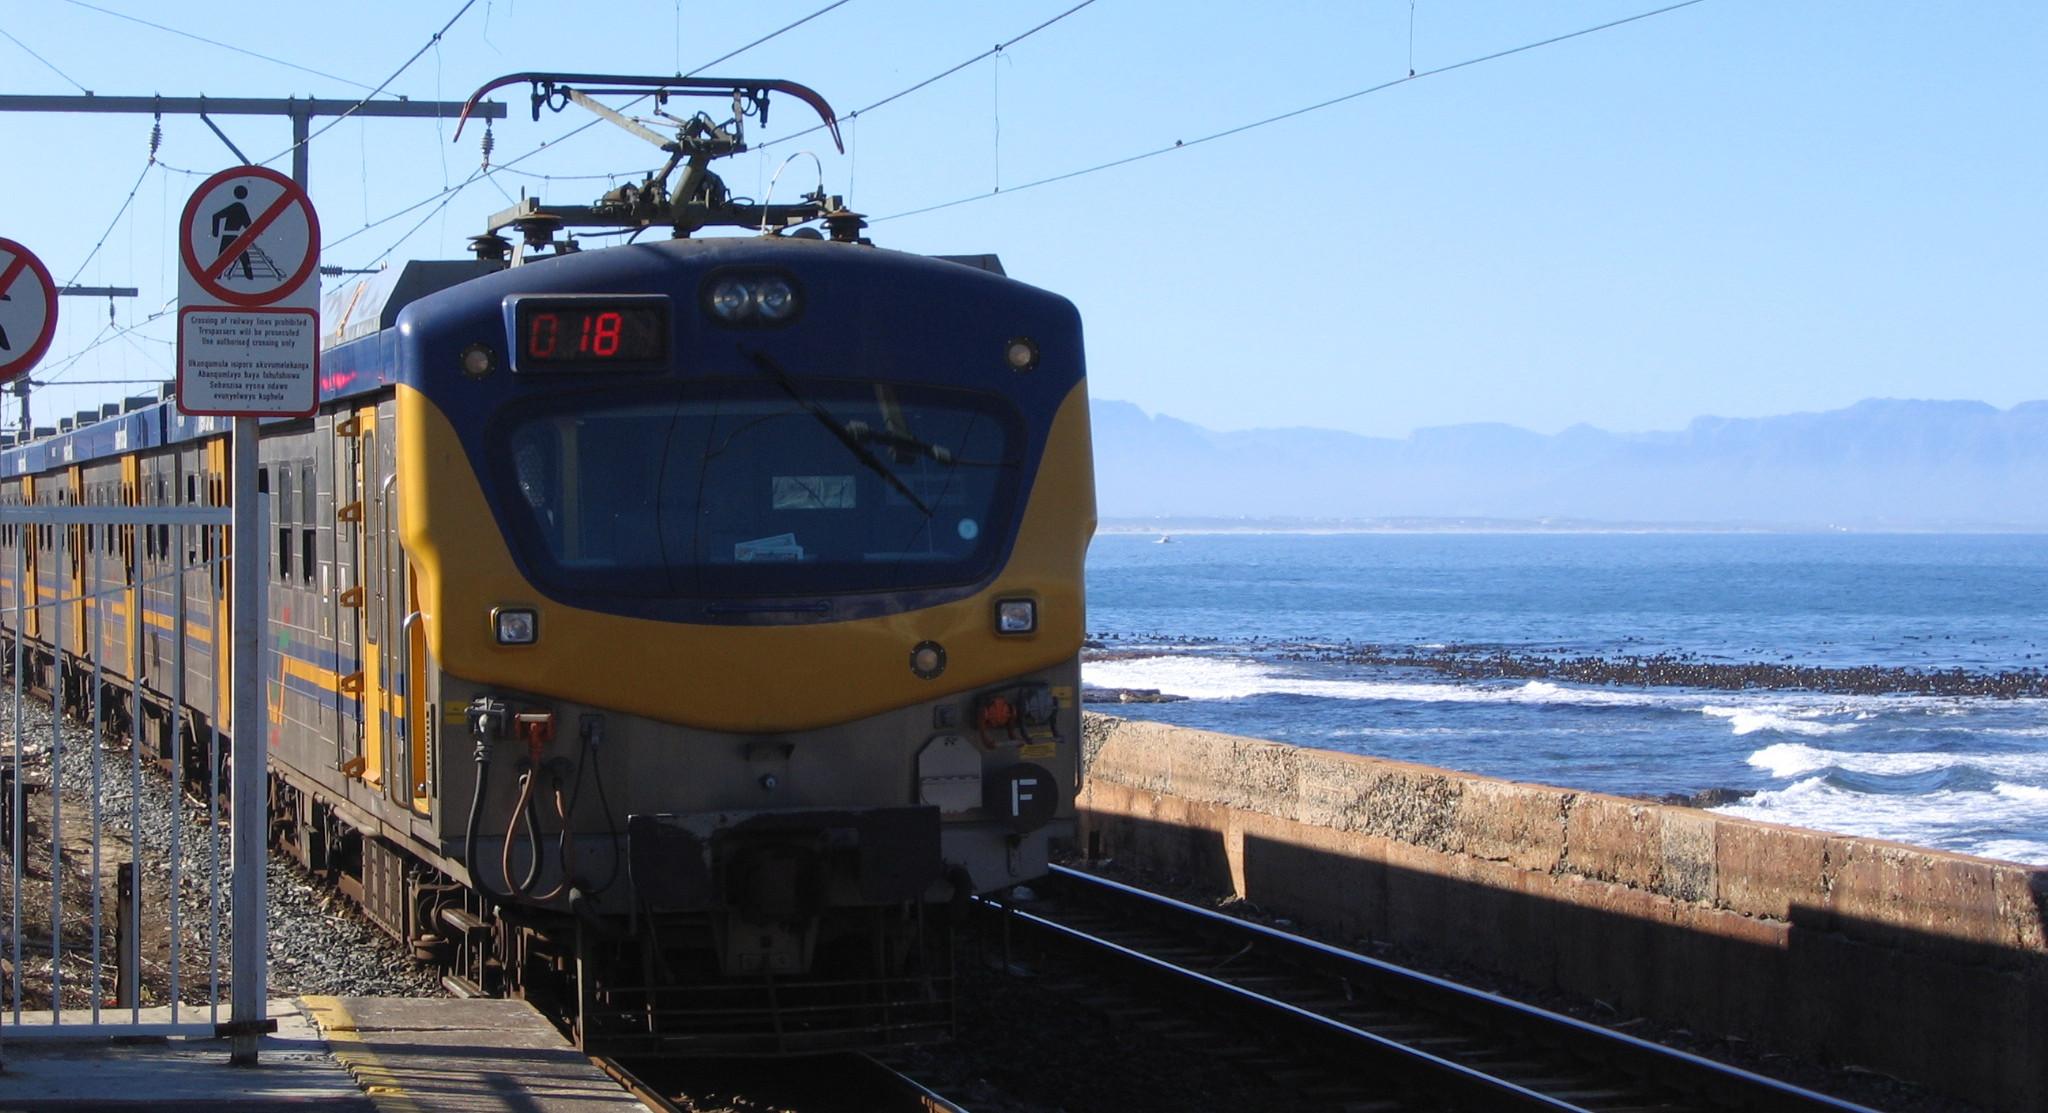 Western Cape Metrorail